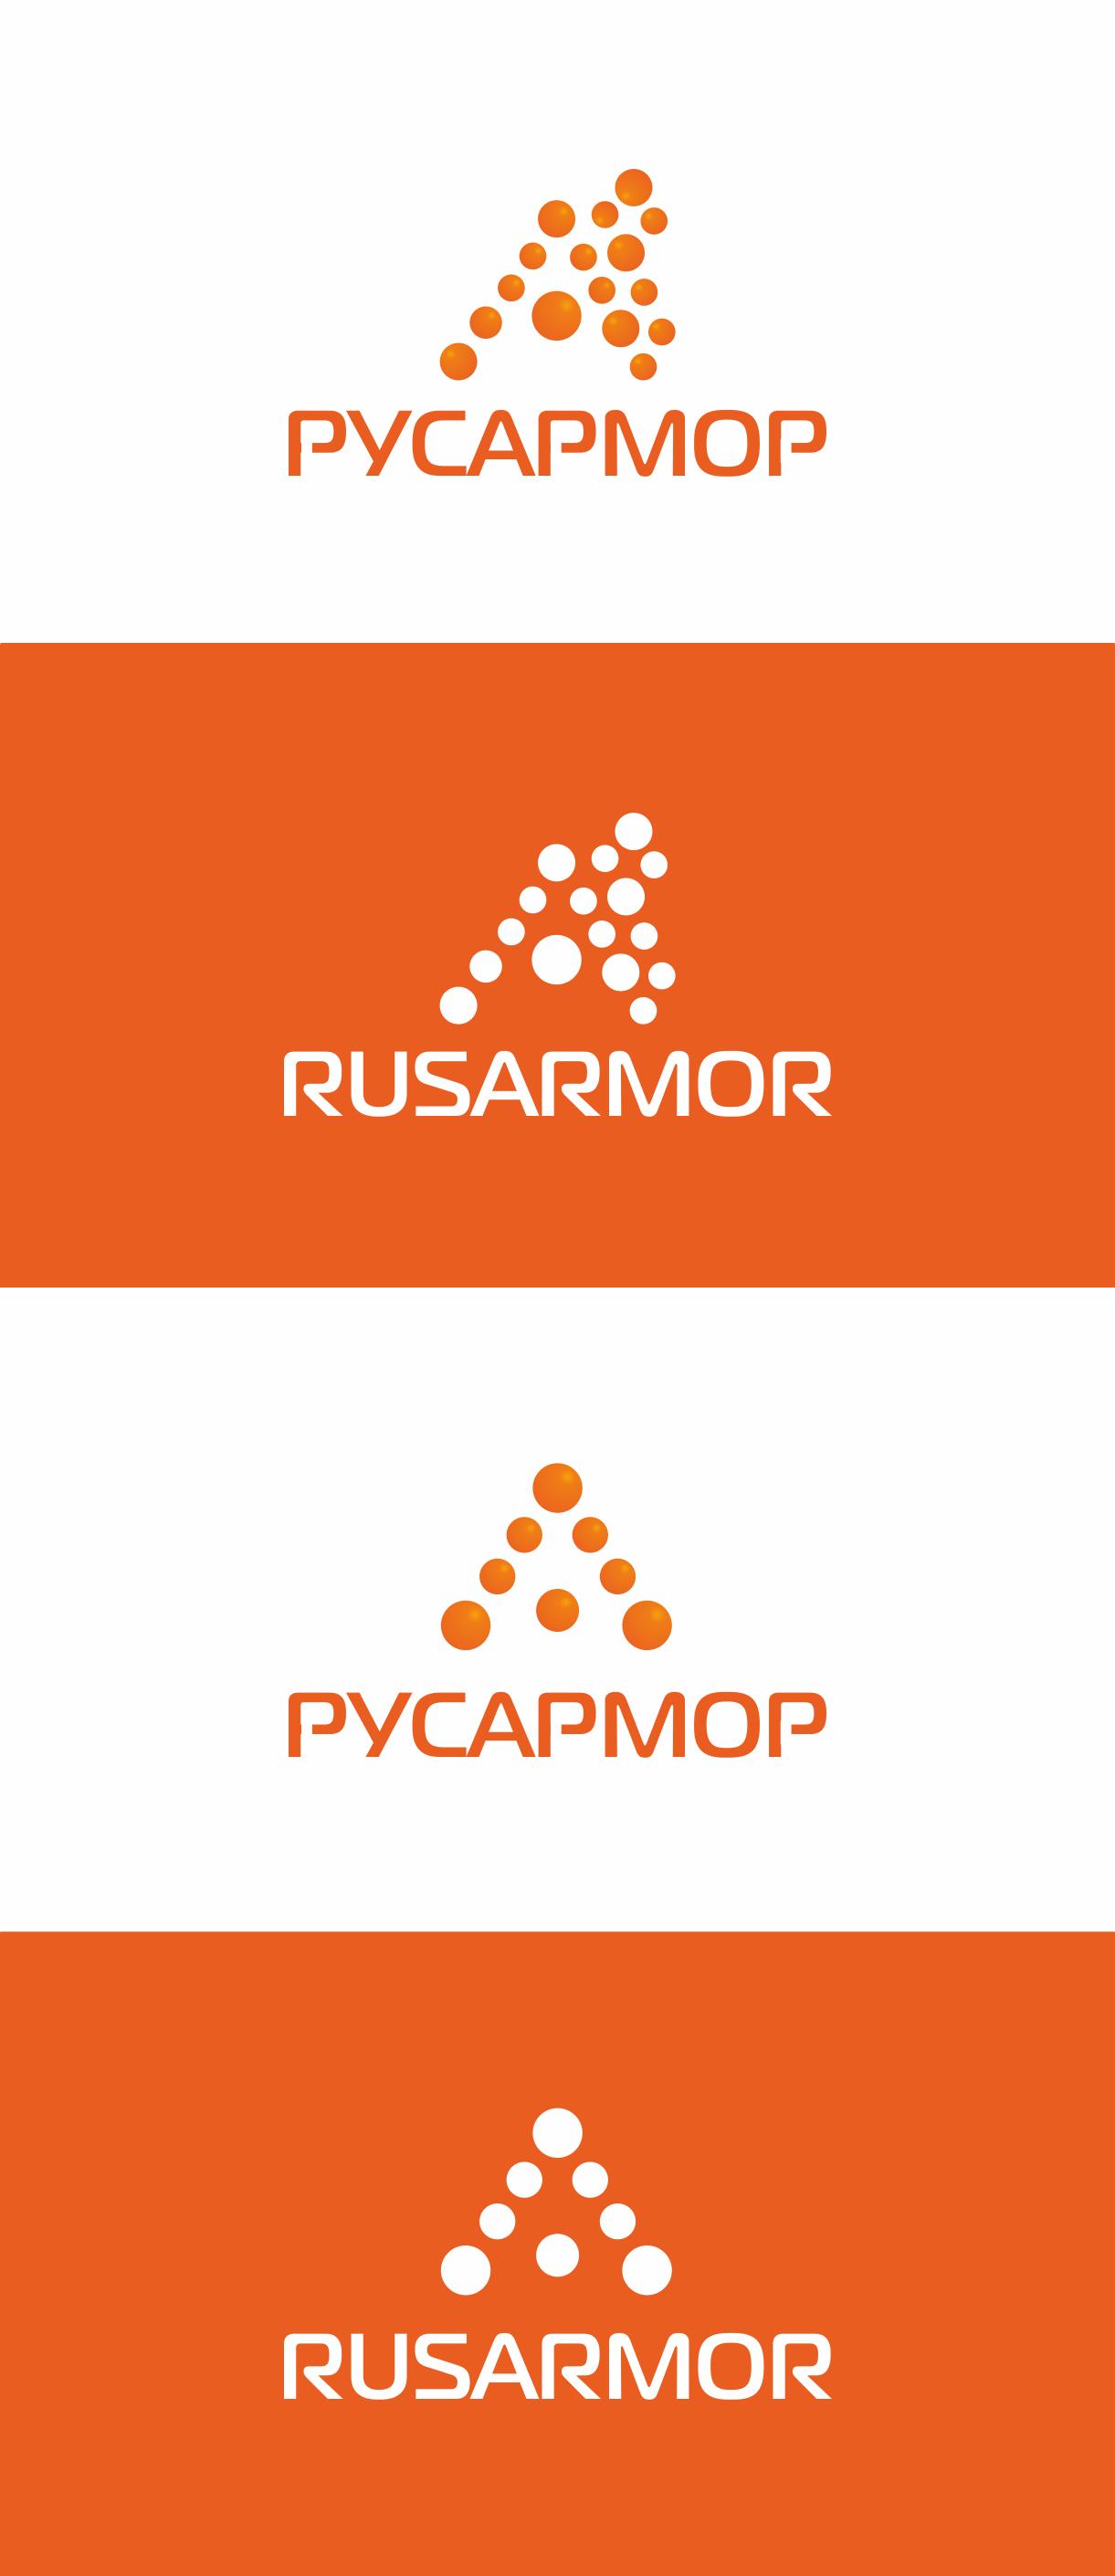 Разработка логотипа технологического стартапа РУСАРМОР фото f_7065a07cc2920e57.png